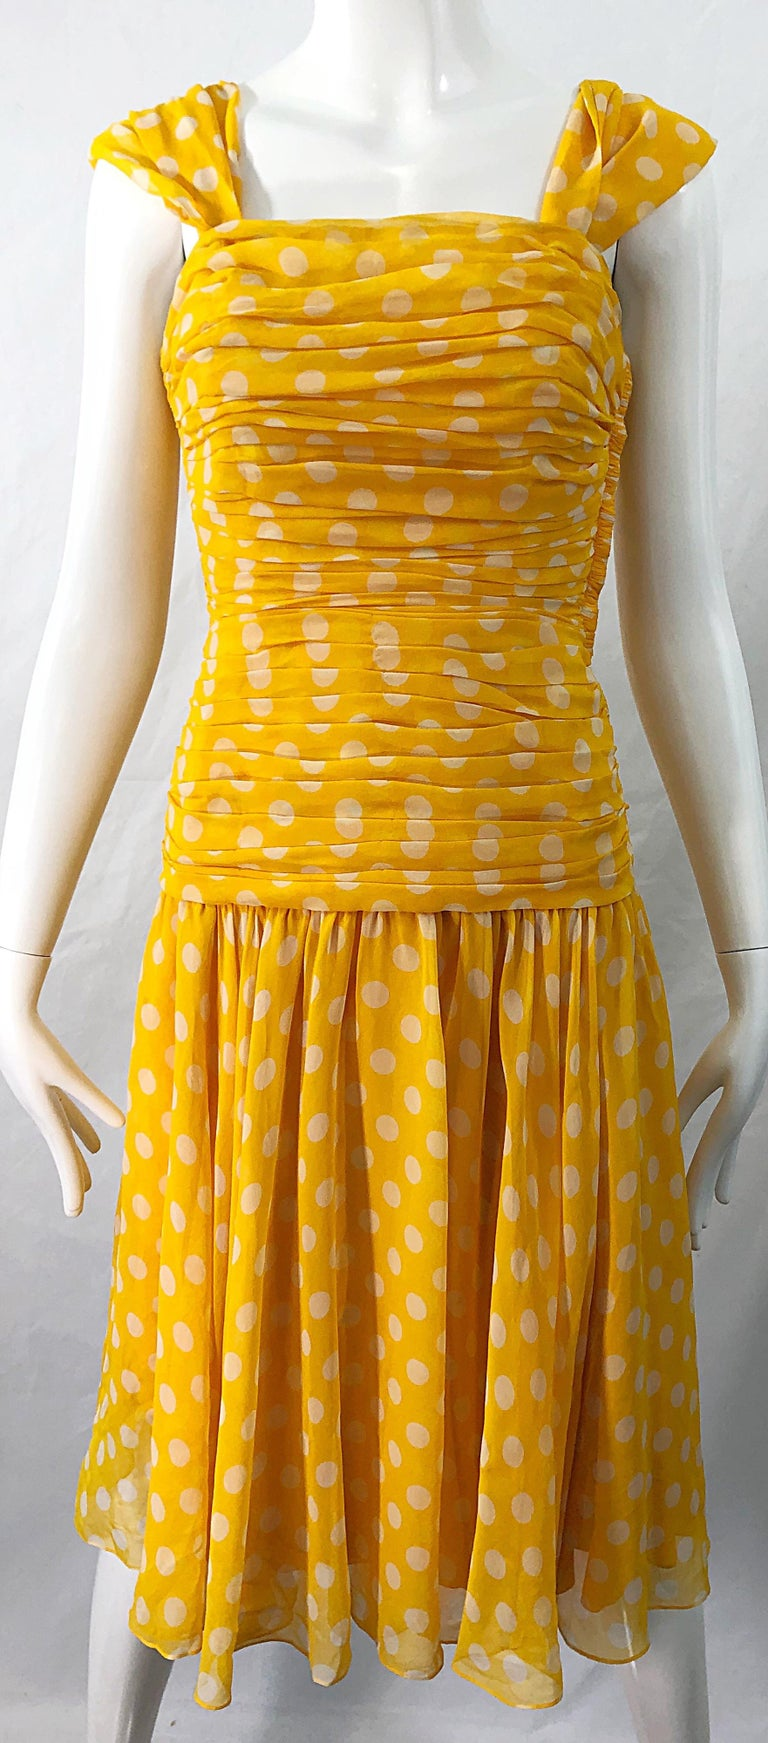 Adele Simpson 1980s Size 4 Yellow White Silk Chiffon Polka Dot Vintage 80s Dress For Sale 4